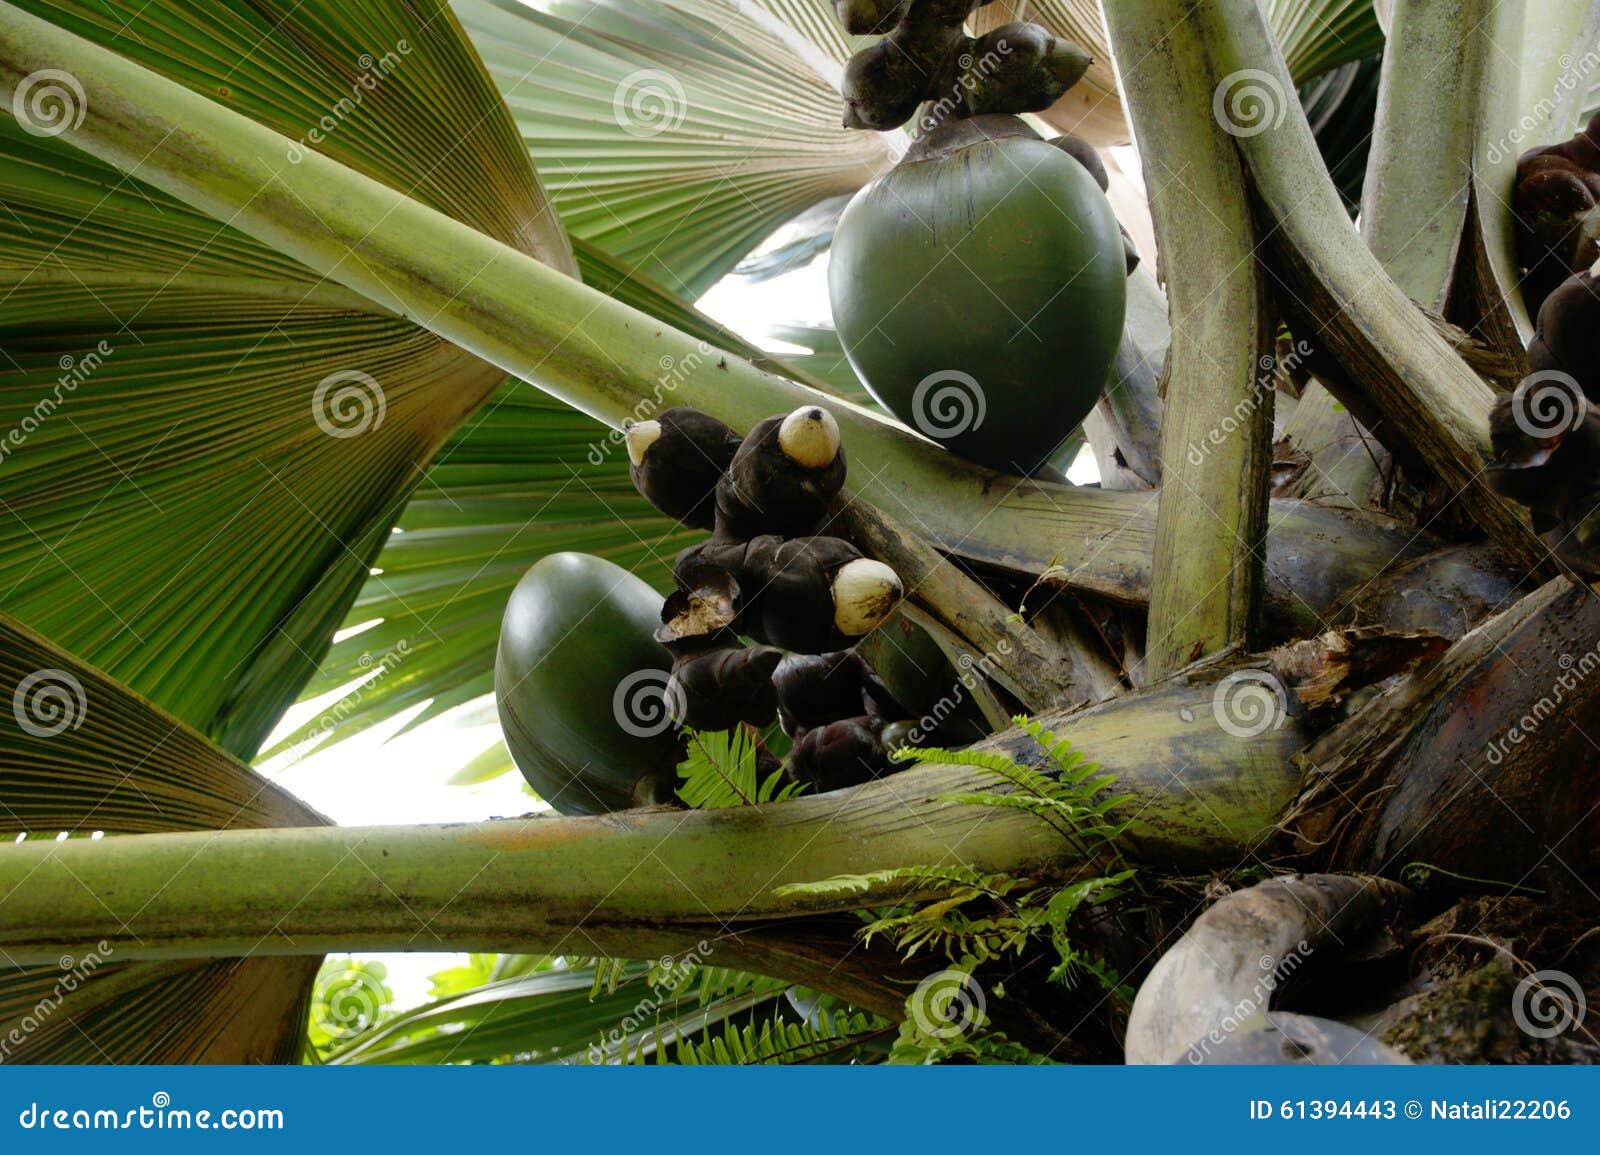 Lodoicea havskokosnöt, coco de mer, dubbel kokosnöt, Lodoicea maldivicacloseup